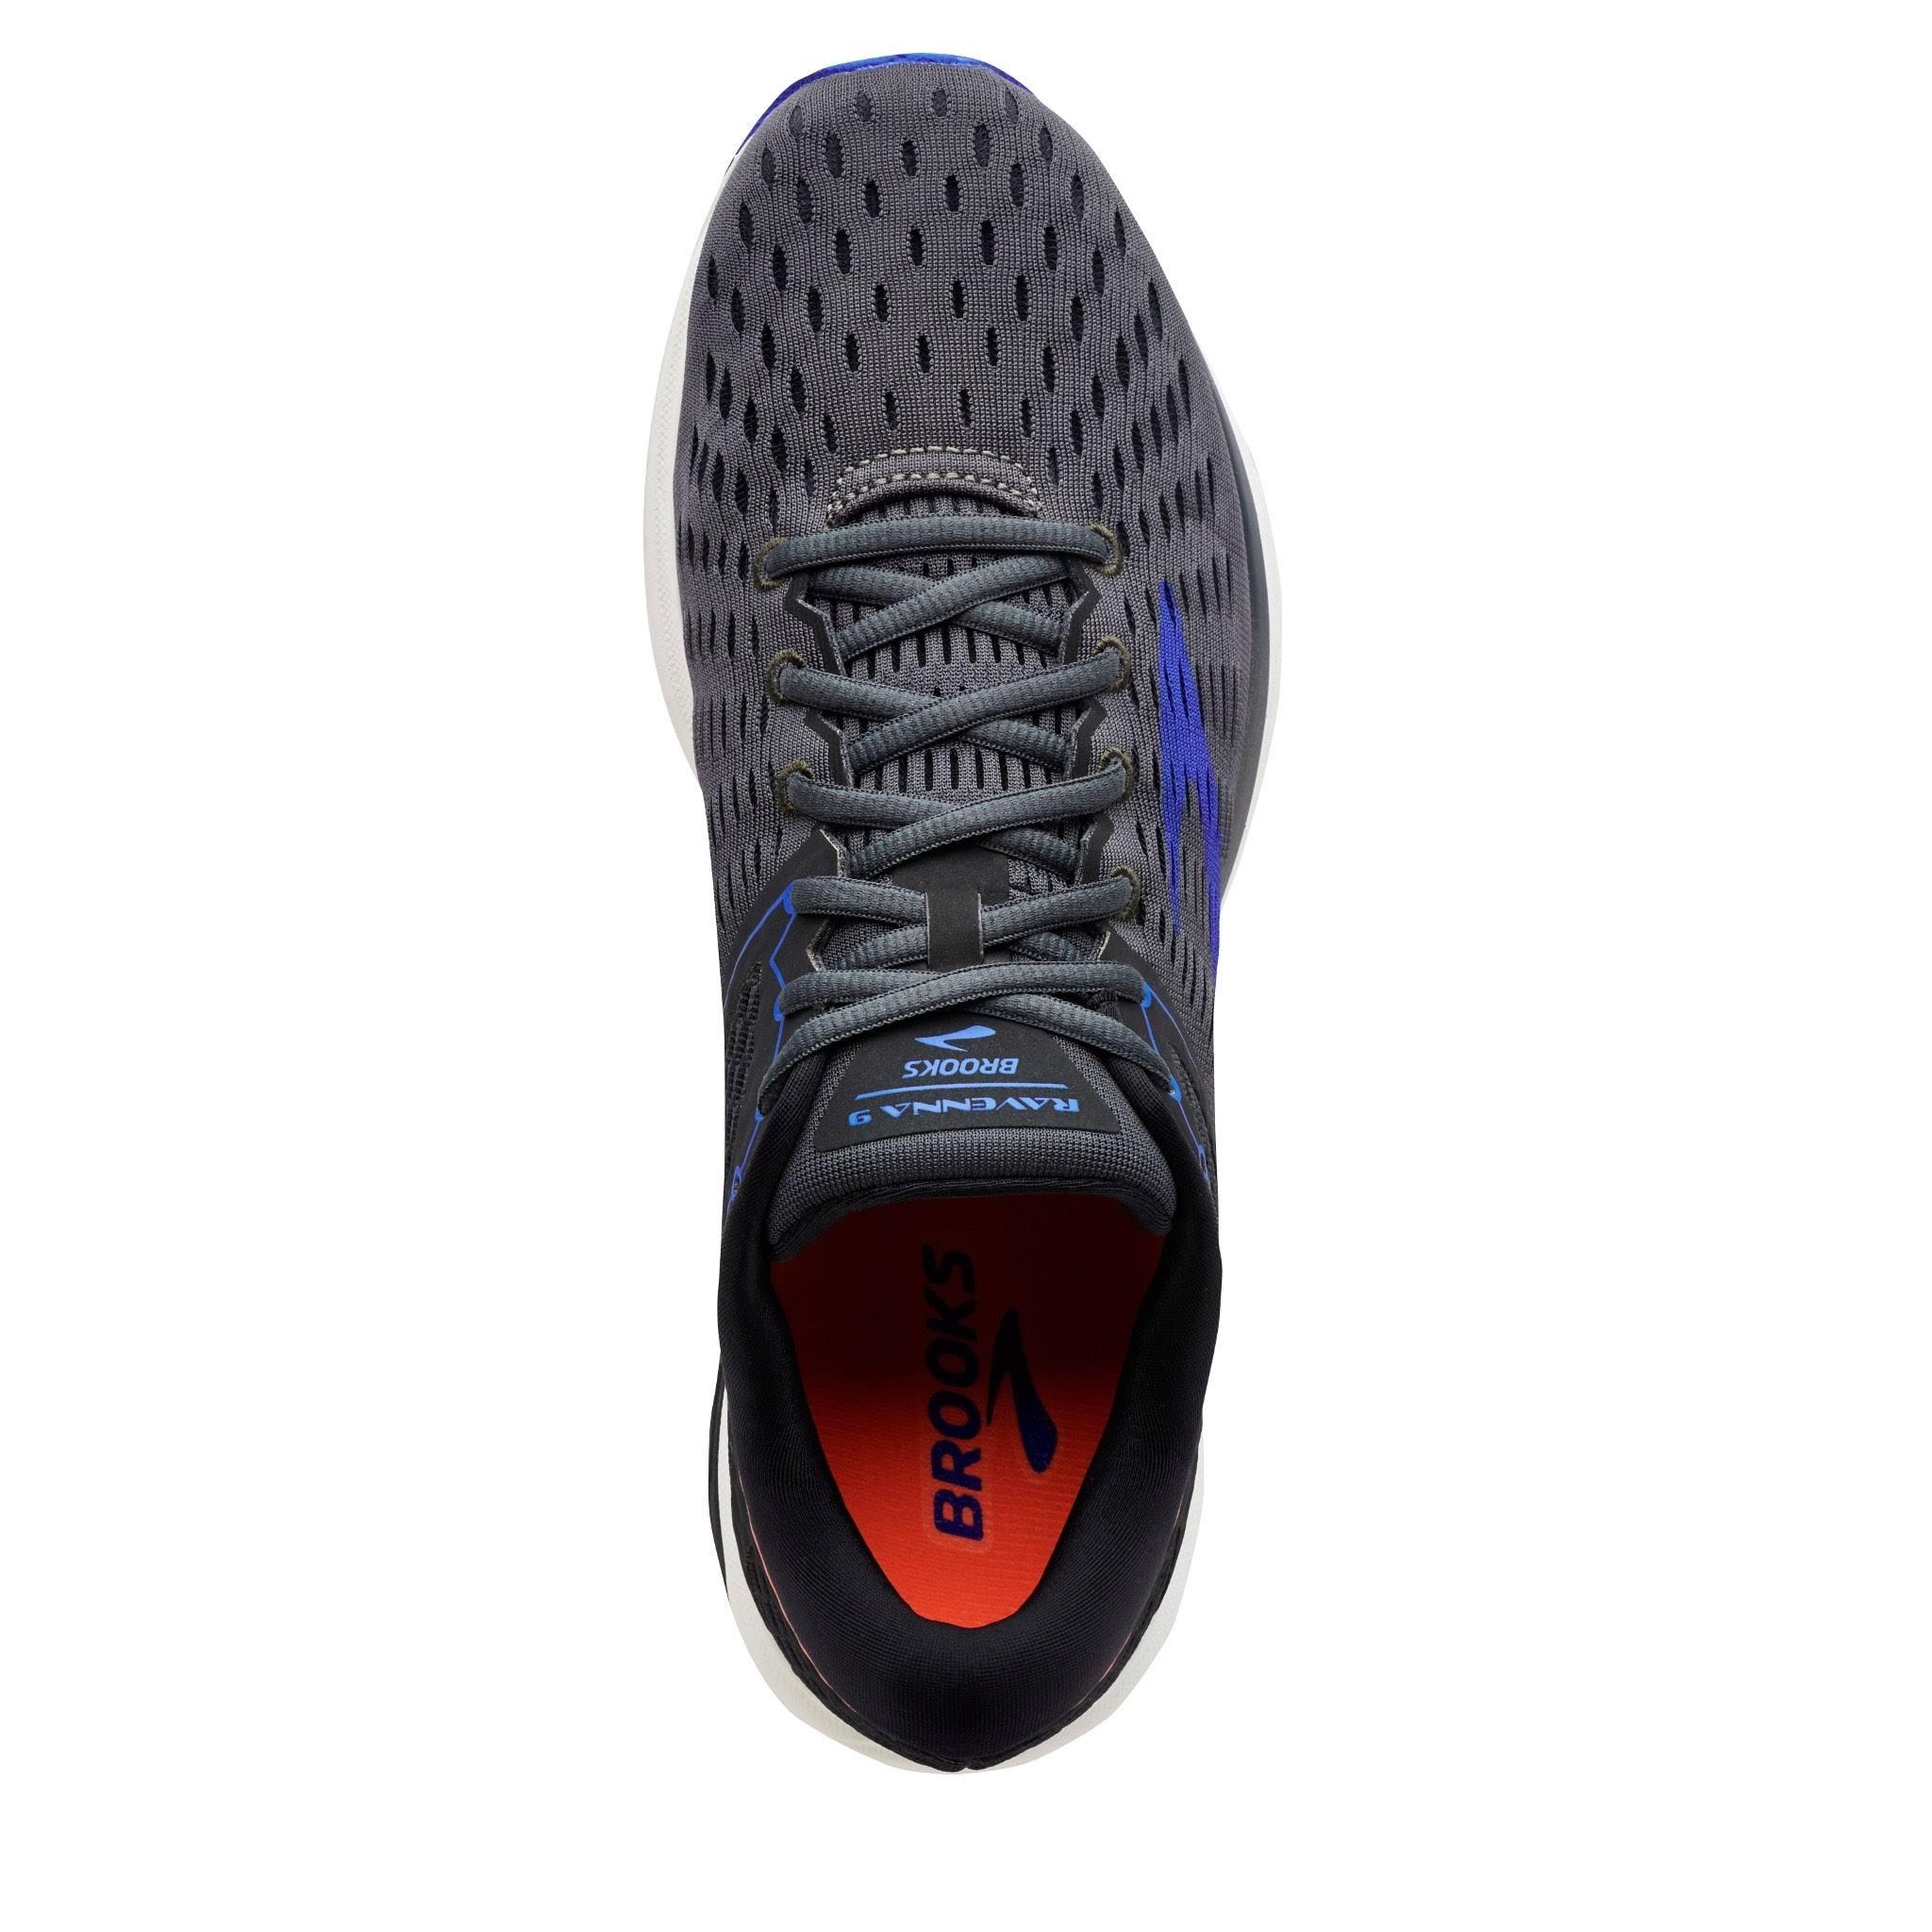 Ravenna Running Tamaño 8 1d 025 Hombre 9 Orange 110280 Brooks Blue Zapatillas Para De Ebony dwIdva